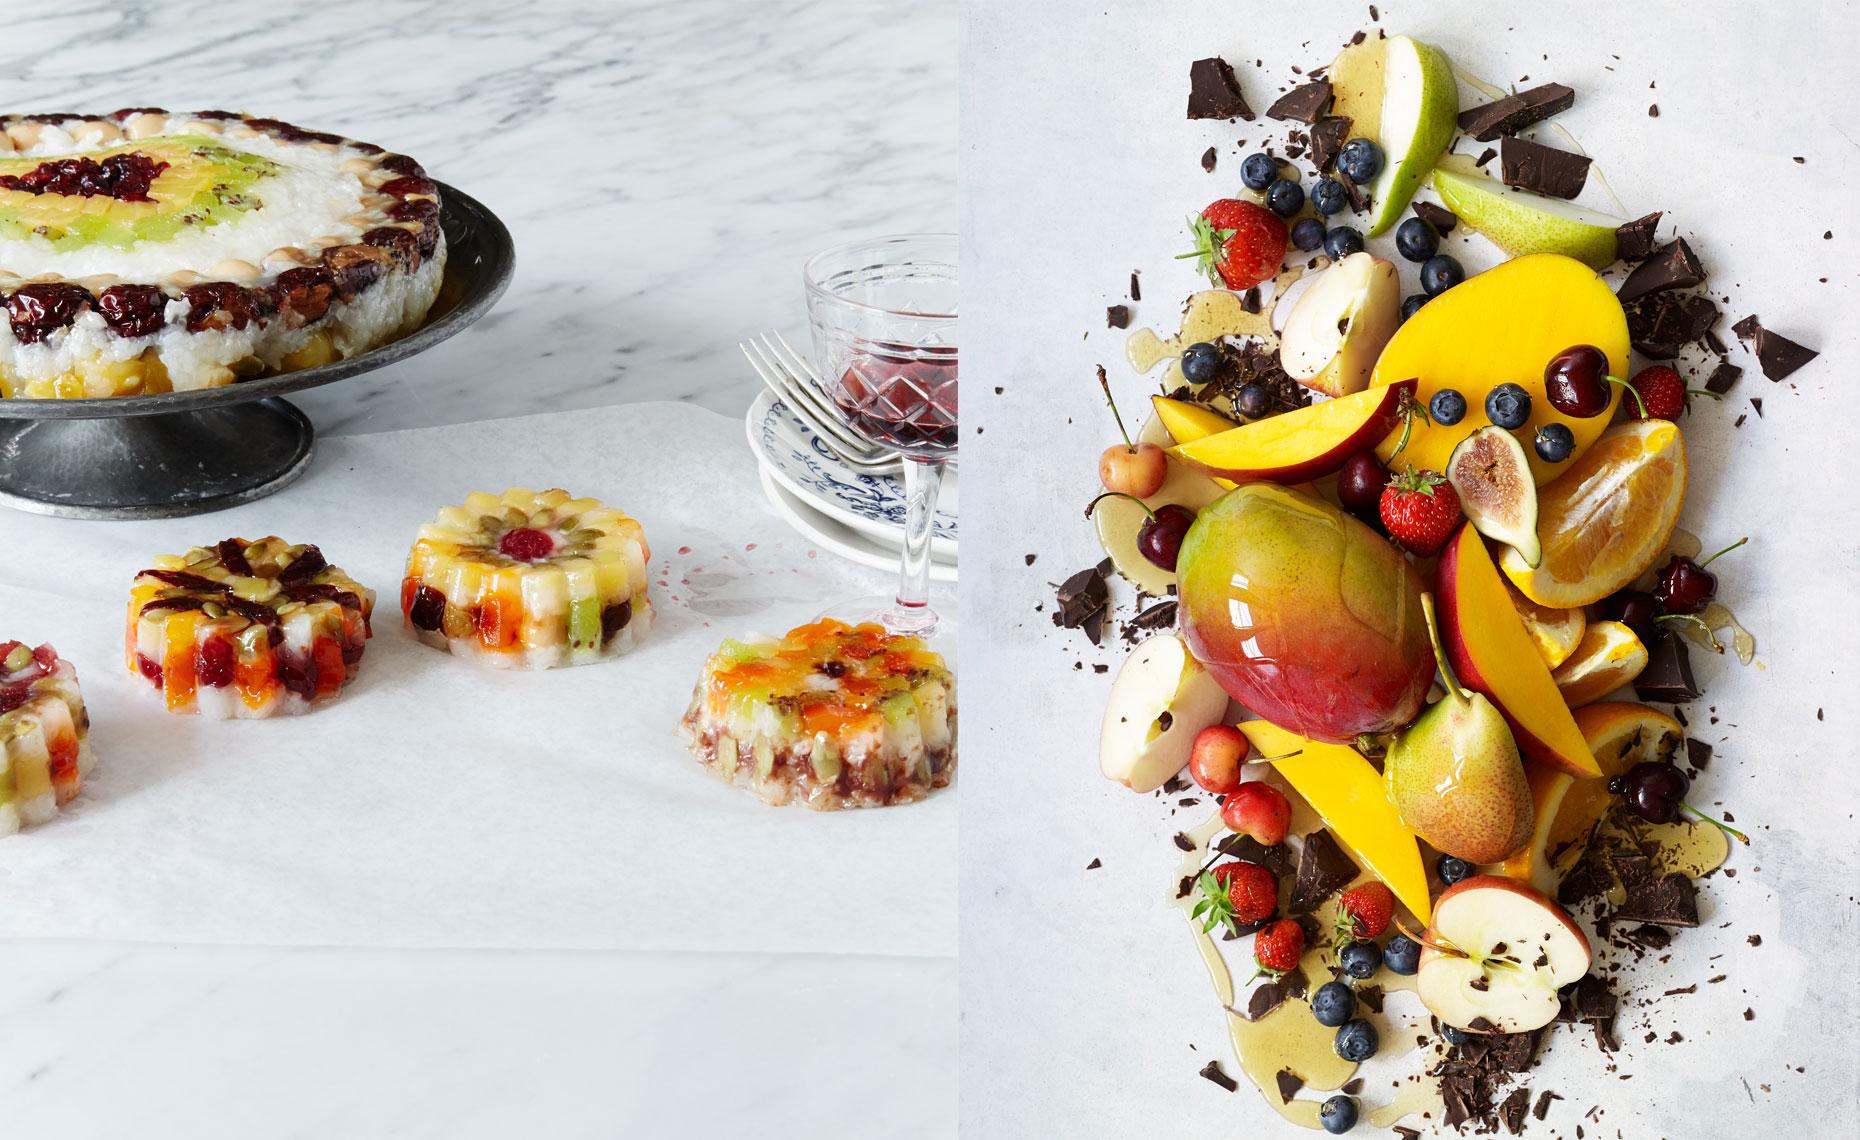 rice-cake-and-fruit-mess.jpg